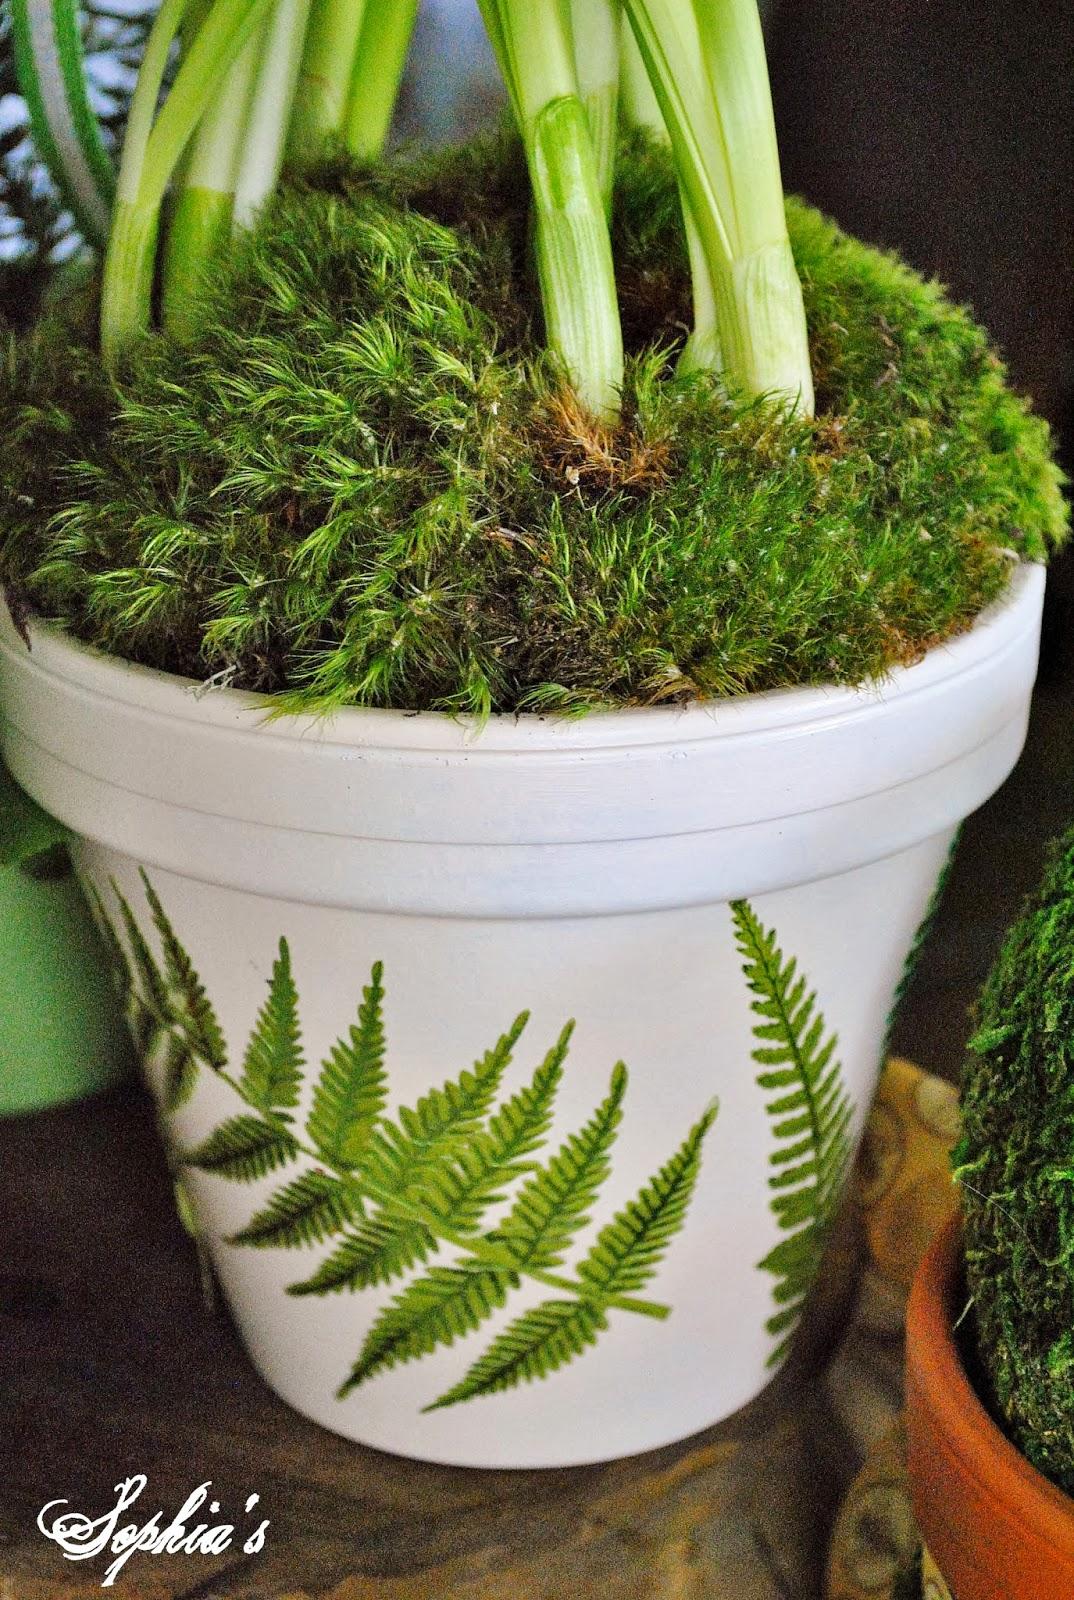 sophia's: diy spring clay pots & michaels pinterest party